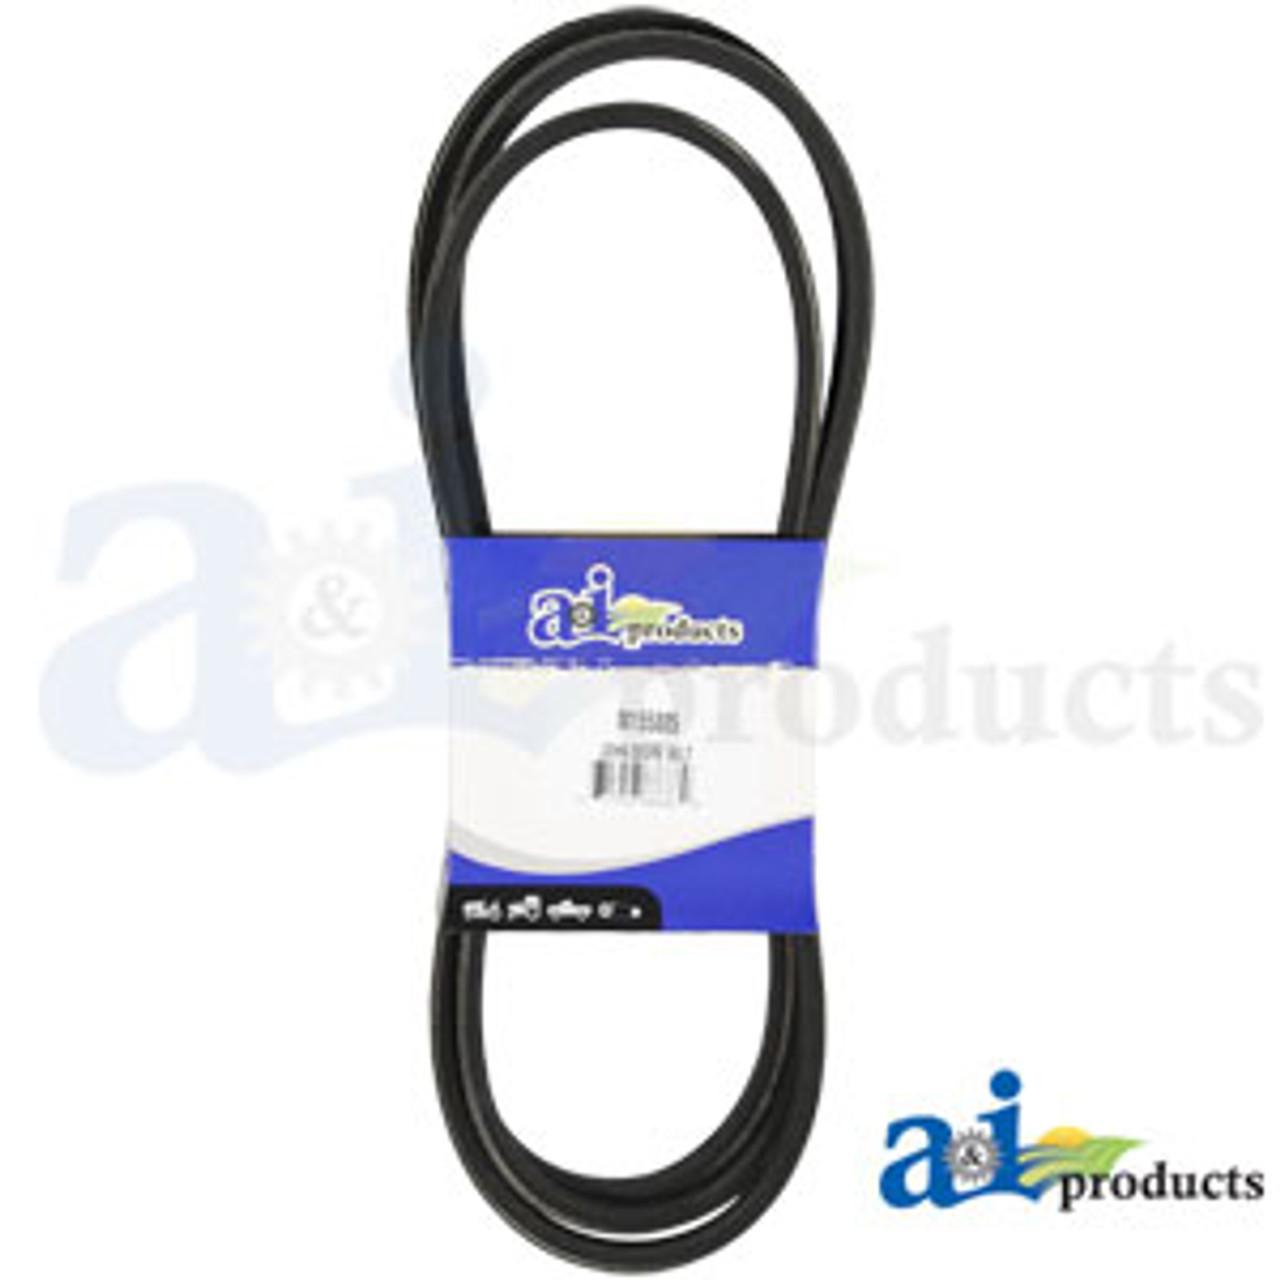 KUBOTA 70000-73987 made with Kevlar Replacement Belt